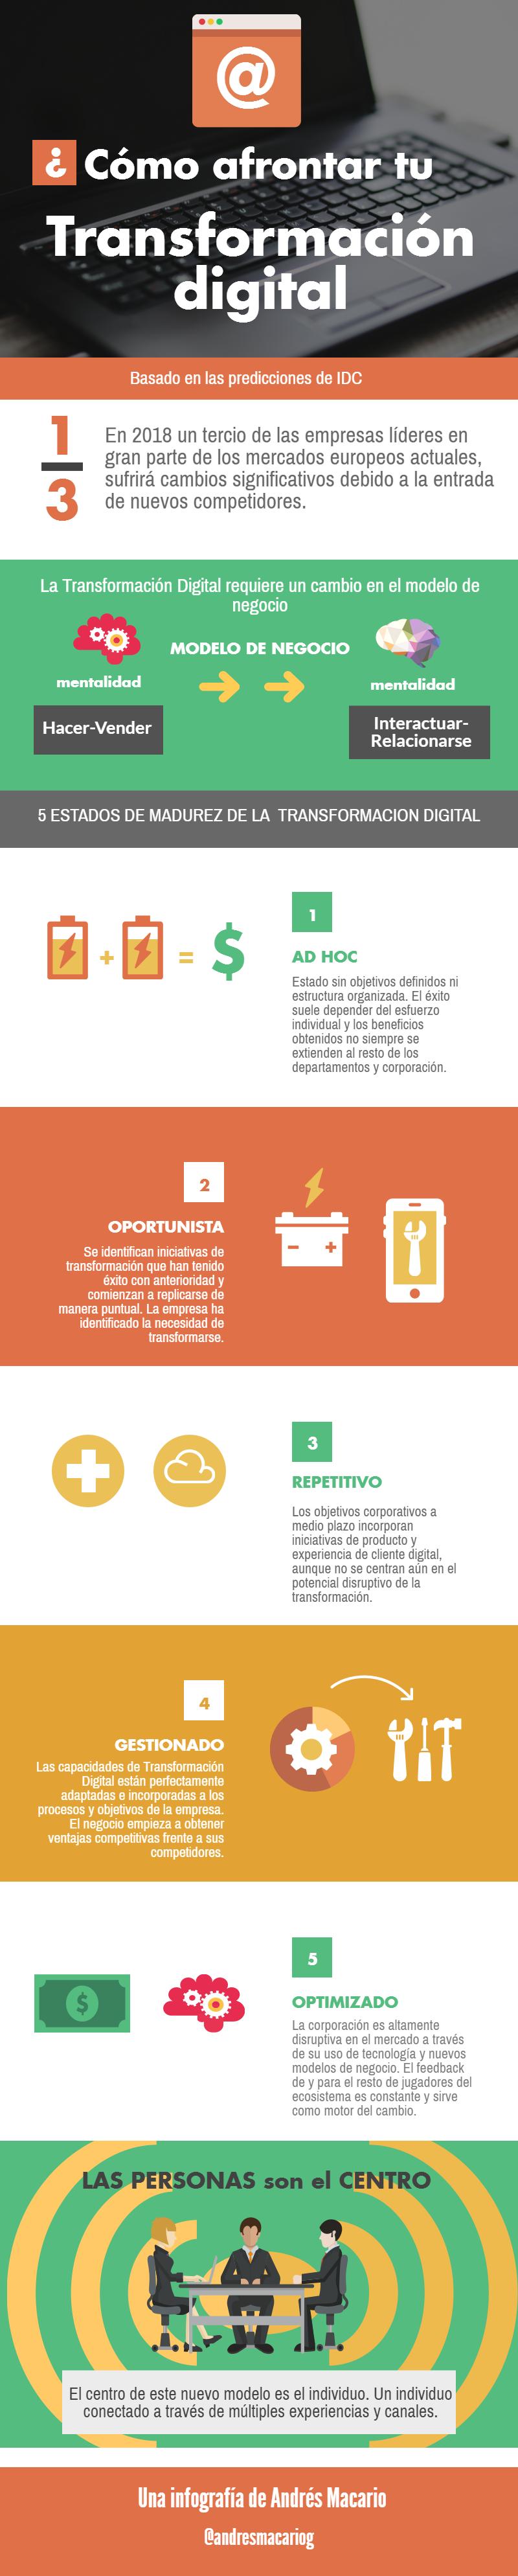 Como abordar tu transformacion digital-Infografia Andres Macario